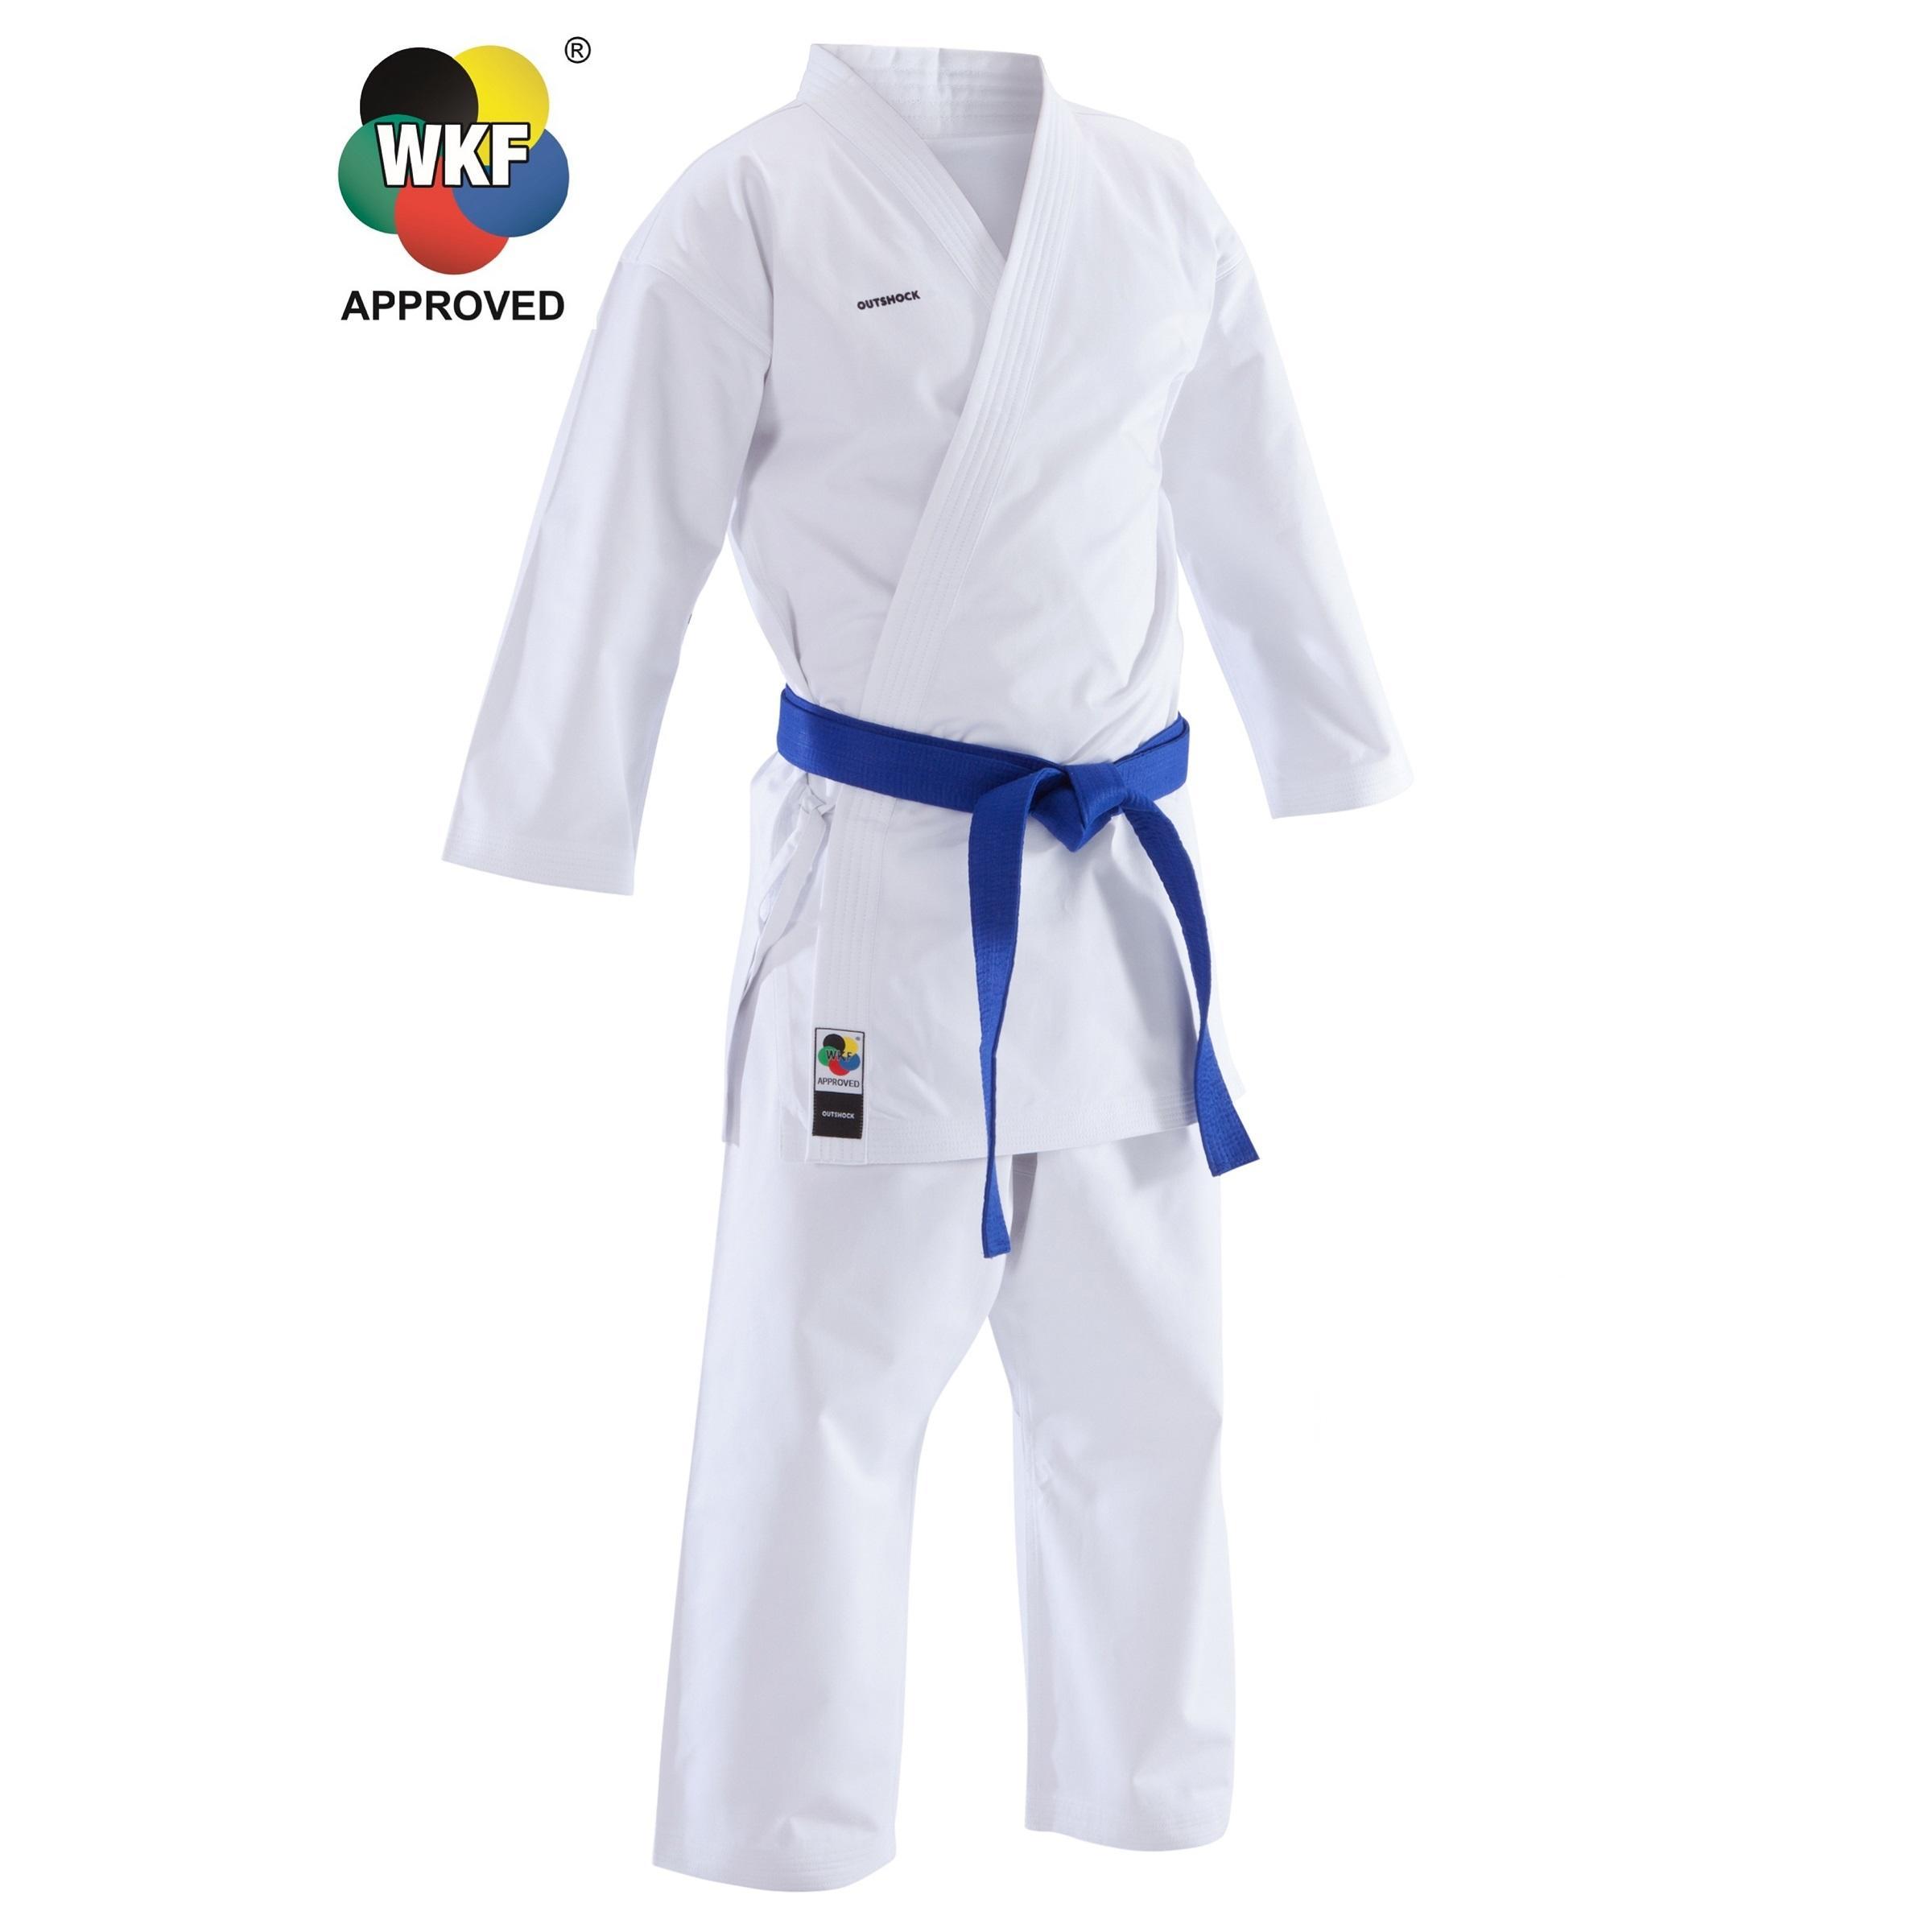 Kimono Karate 500 Adulți Outshock Promoție